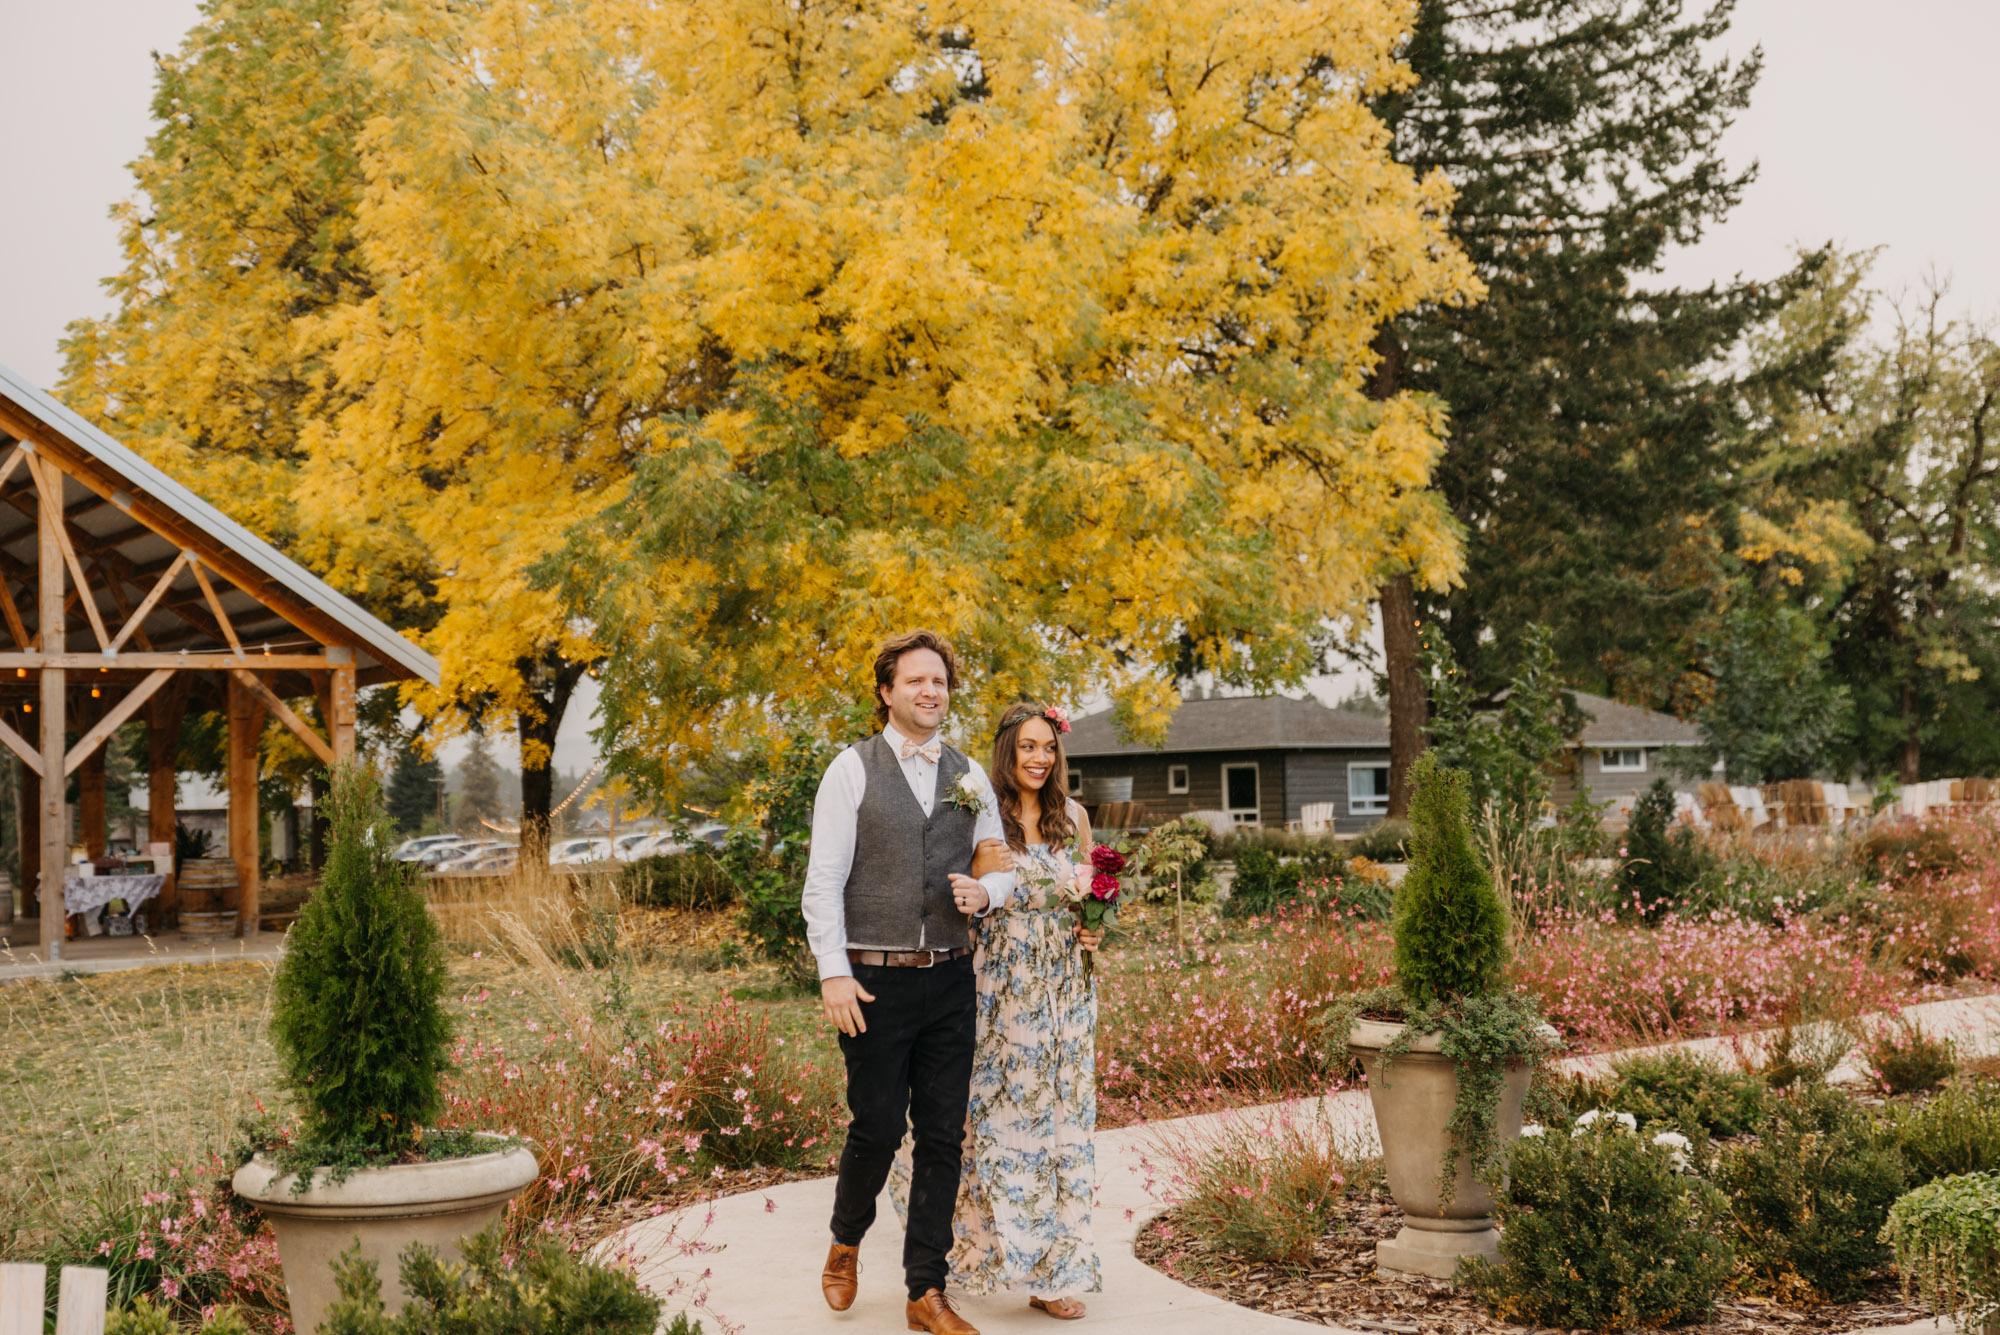 Outdoor-Summer-Ceremony-Washington-Wedding-Rainbow-5280.jpg